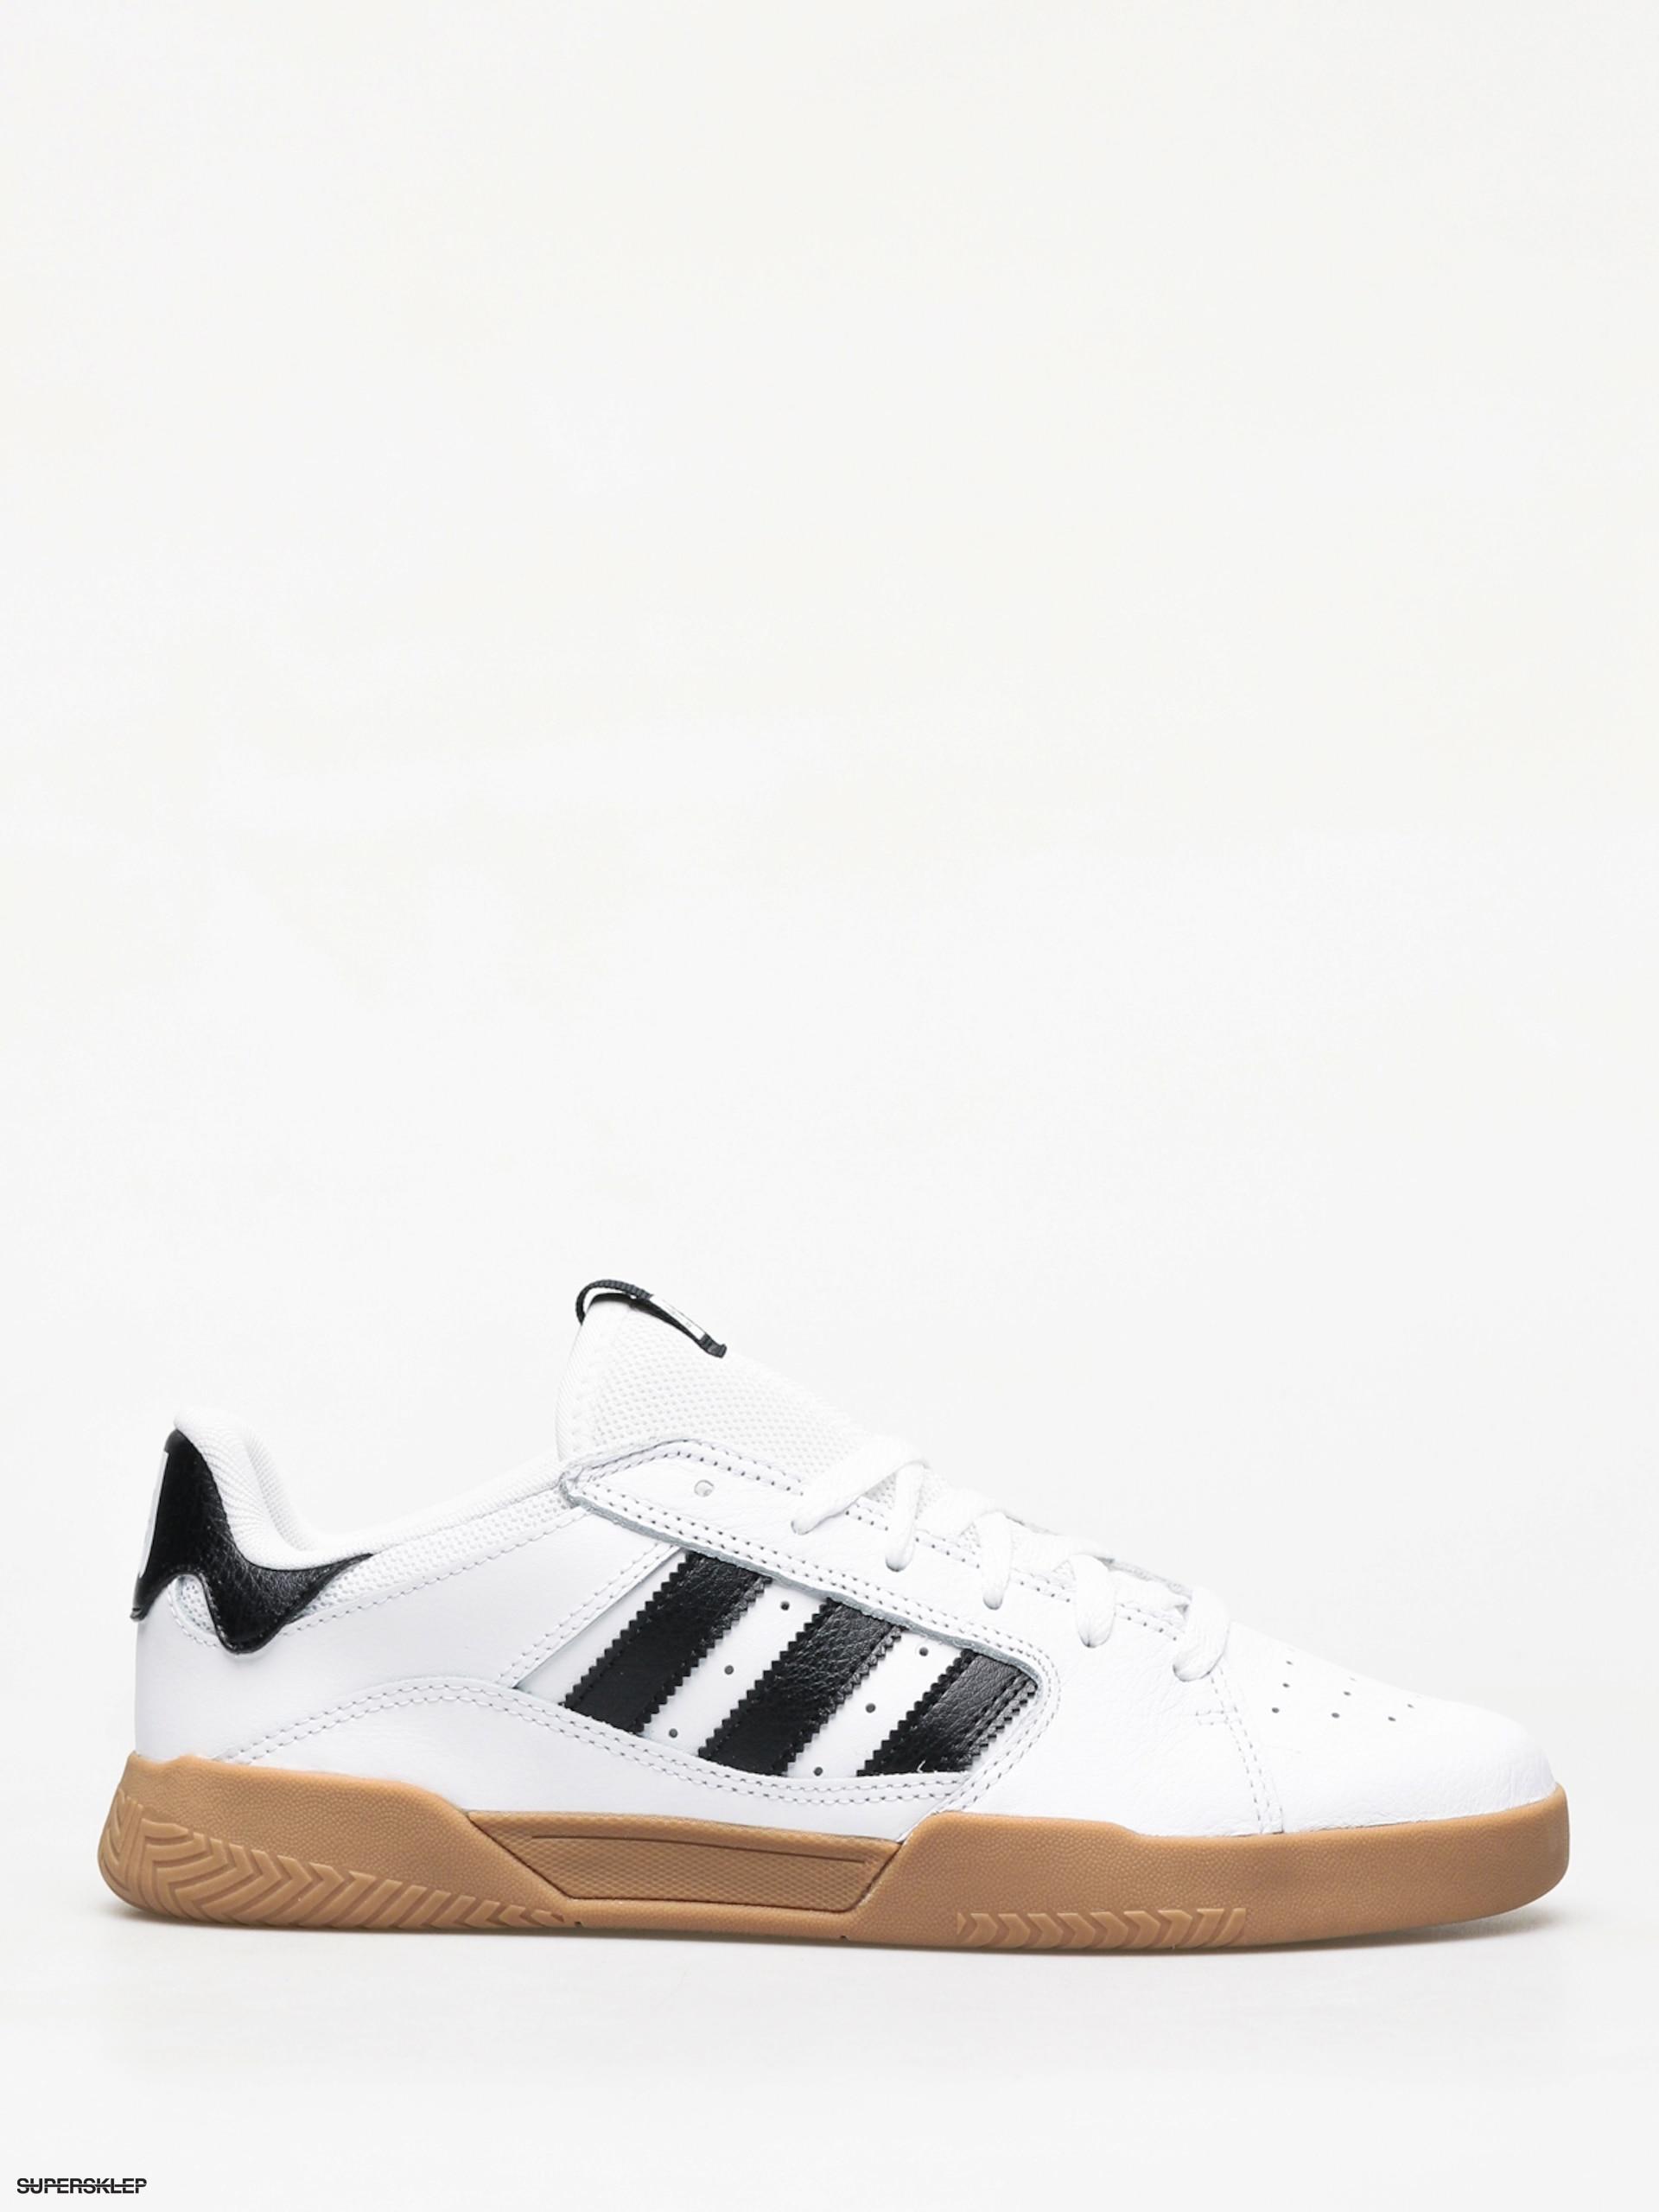 d11ca579e64ae Buty adidas Vrx Low (ftwr white/core black/gum4)